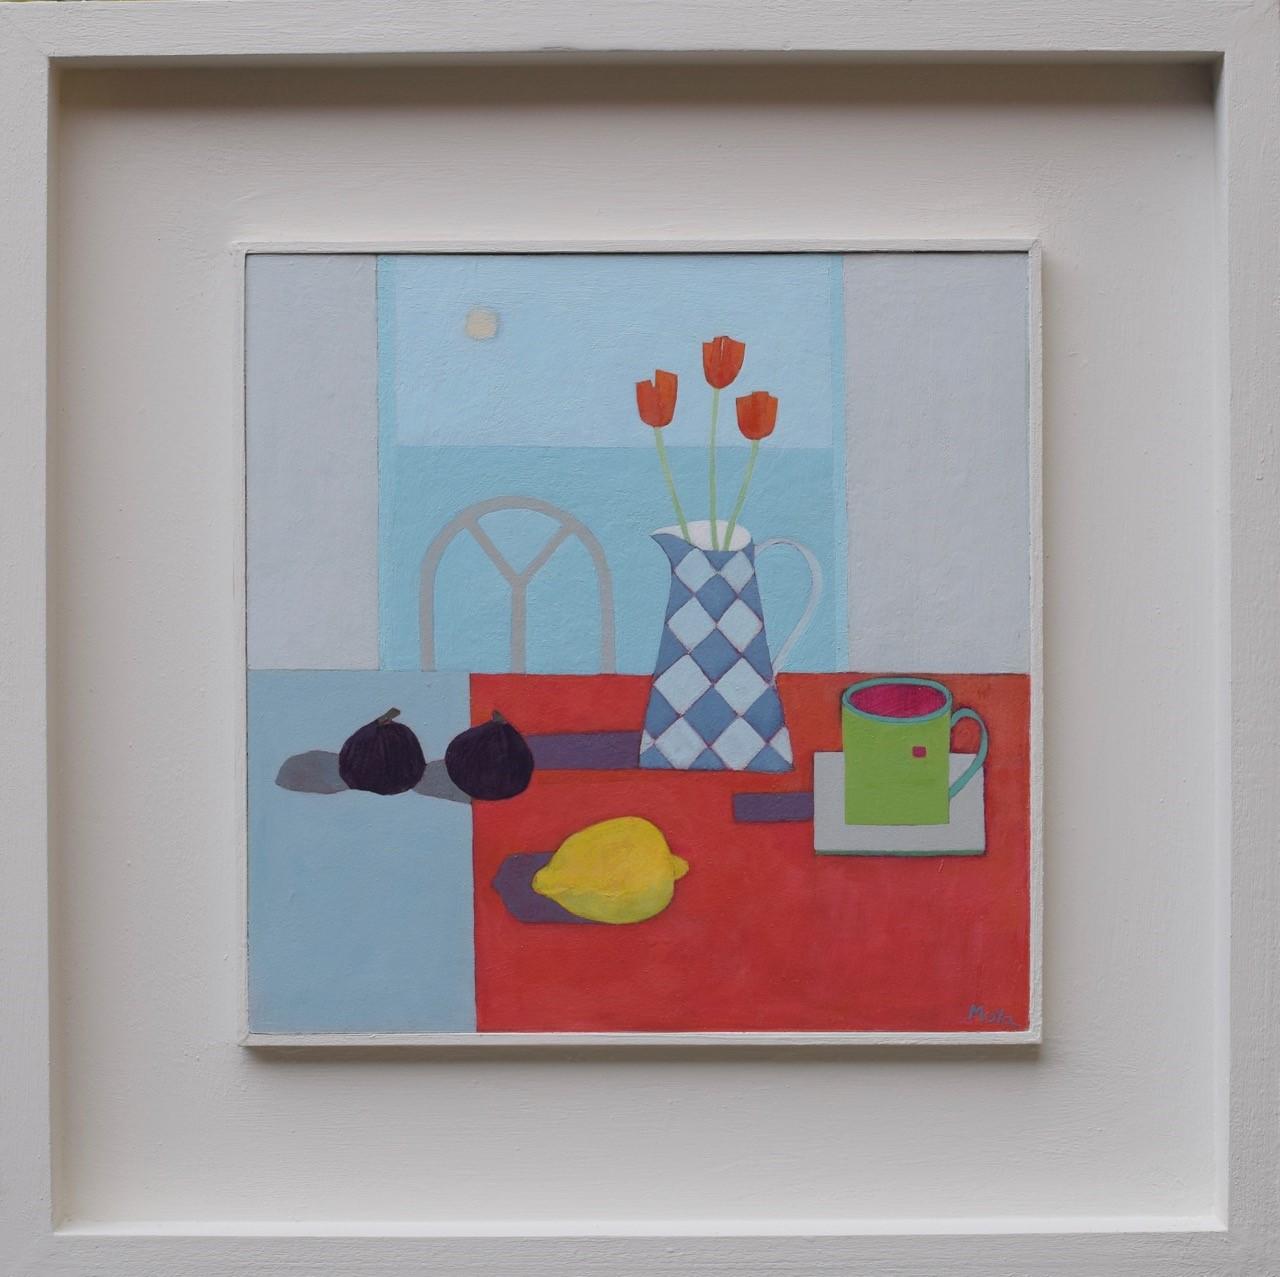 Still Life with Figs  acrylic on board  31.5 x 31.5 cm framed  £495